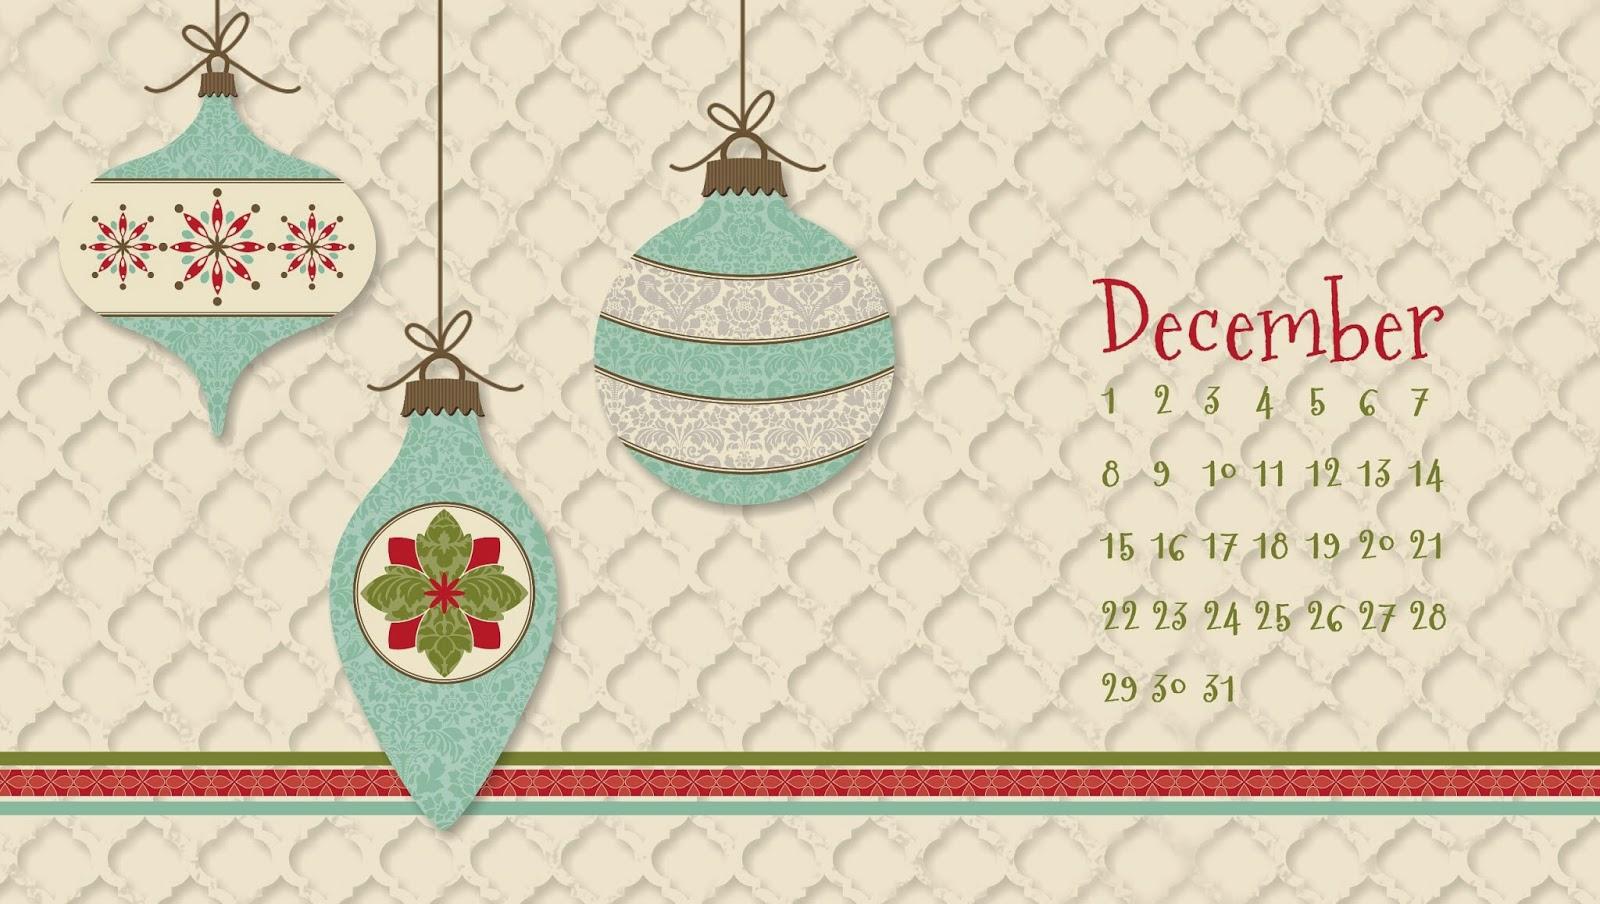 December 2019 Desktop Background Calendar